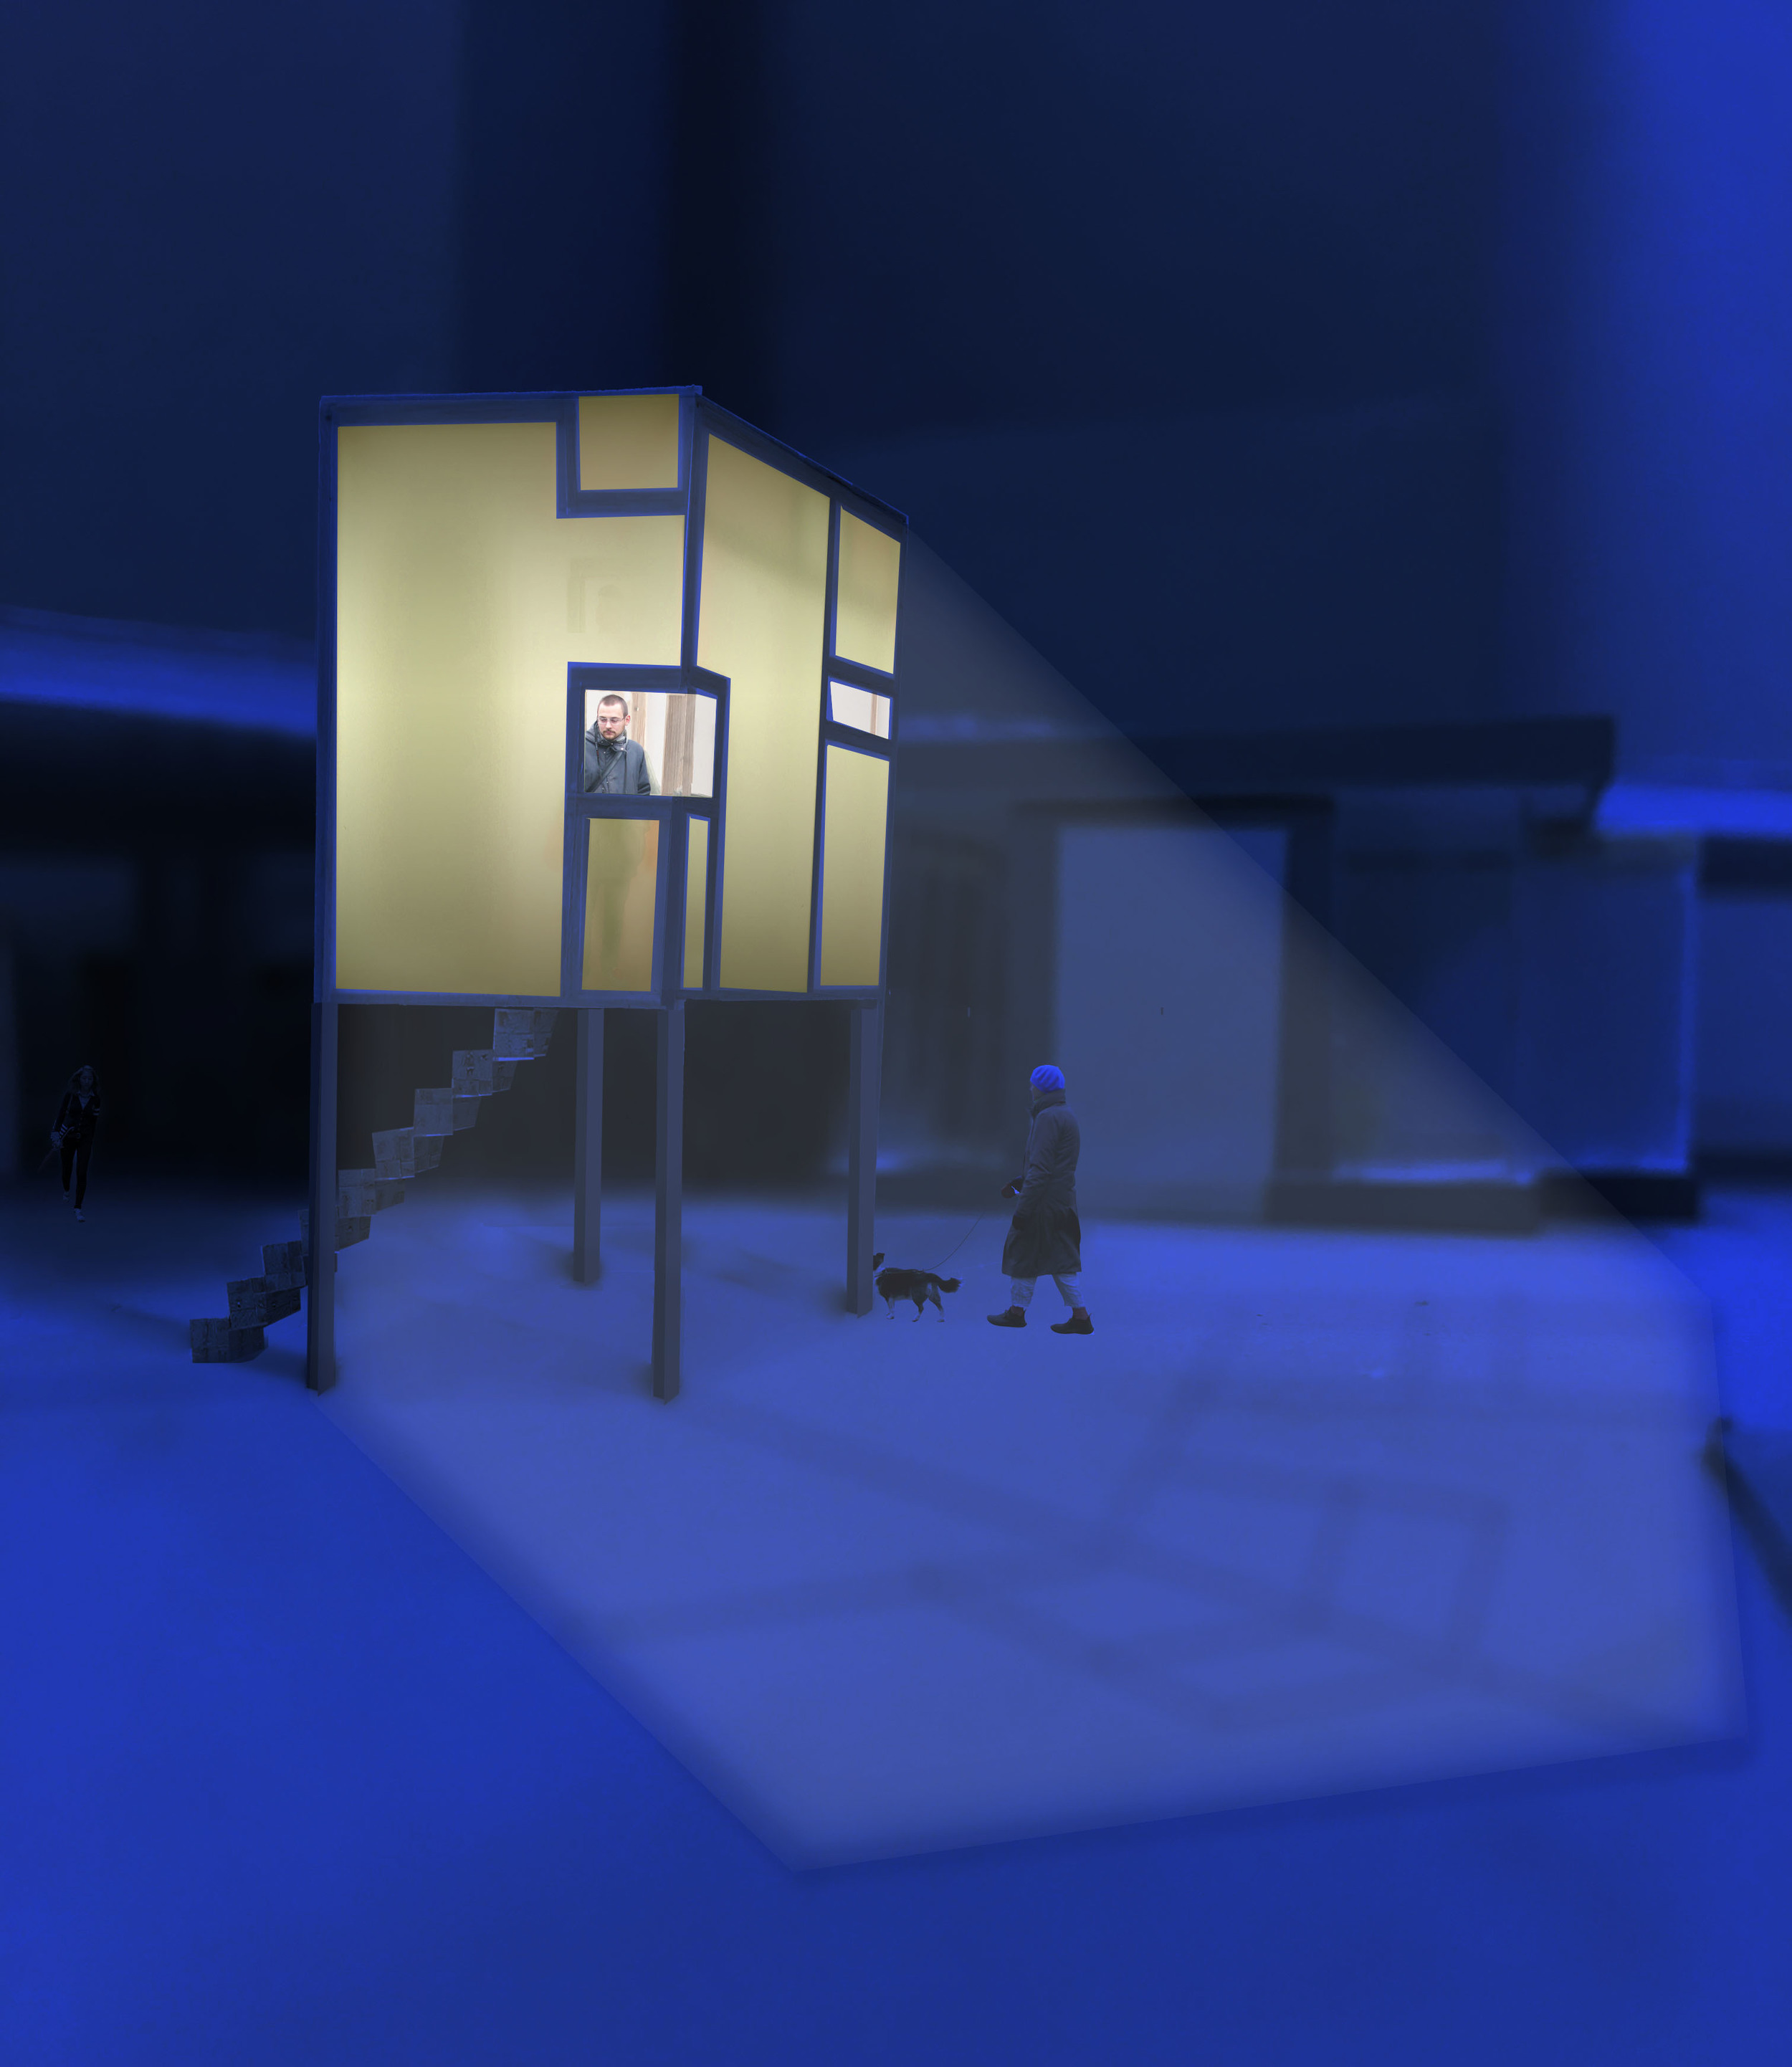 3pers-visual-nacht 3.jpg